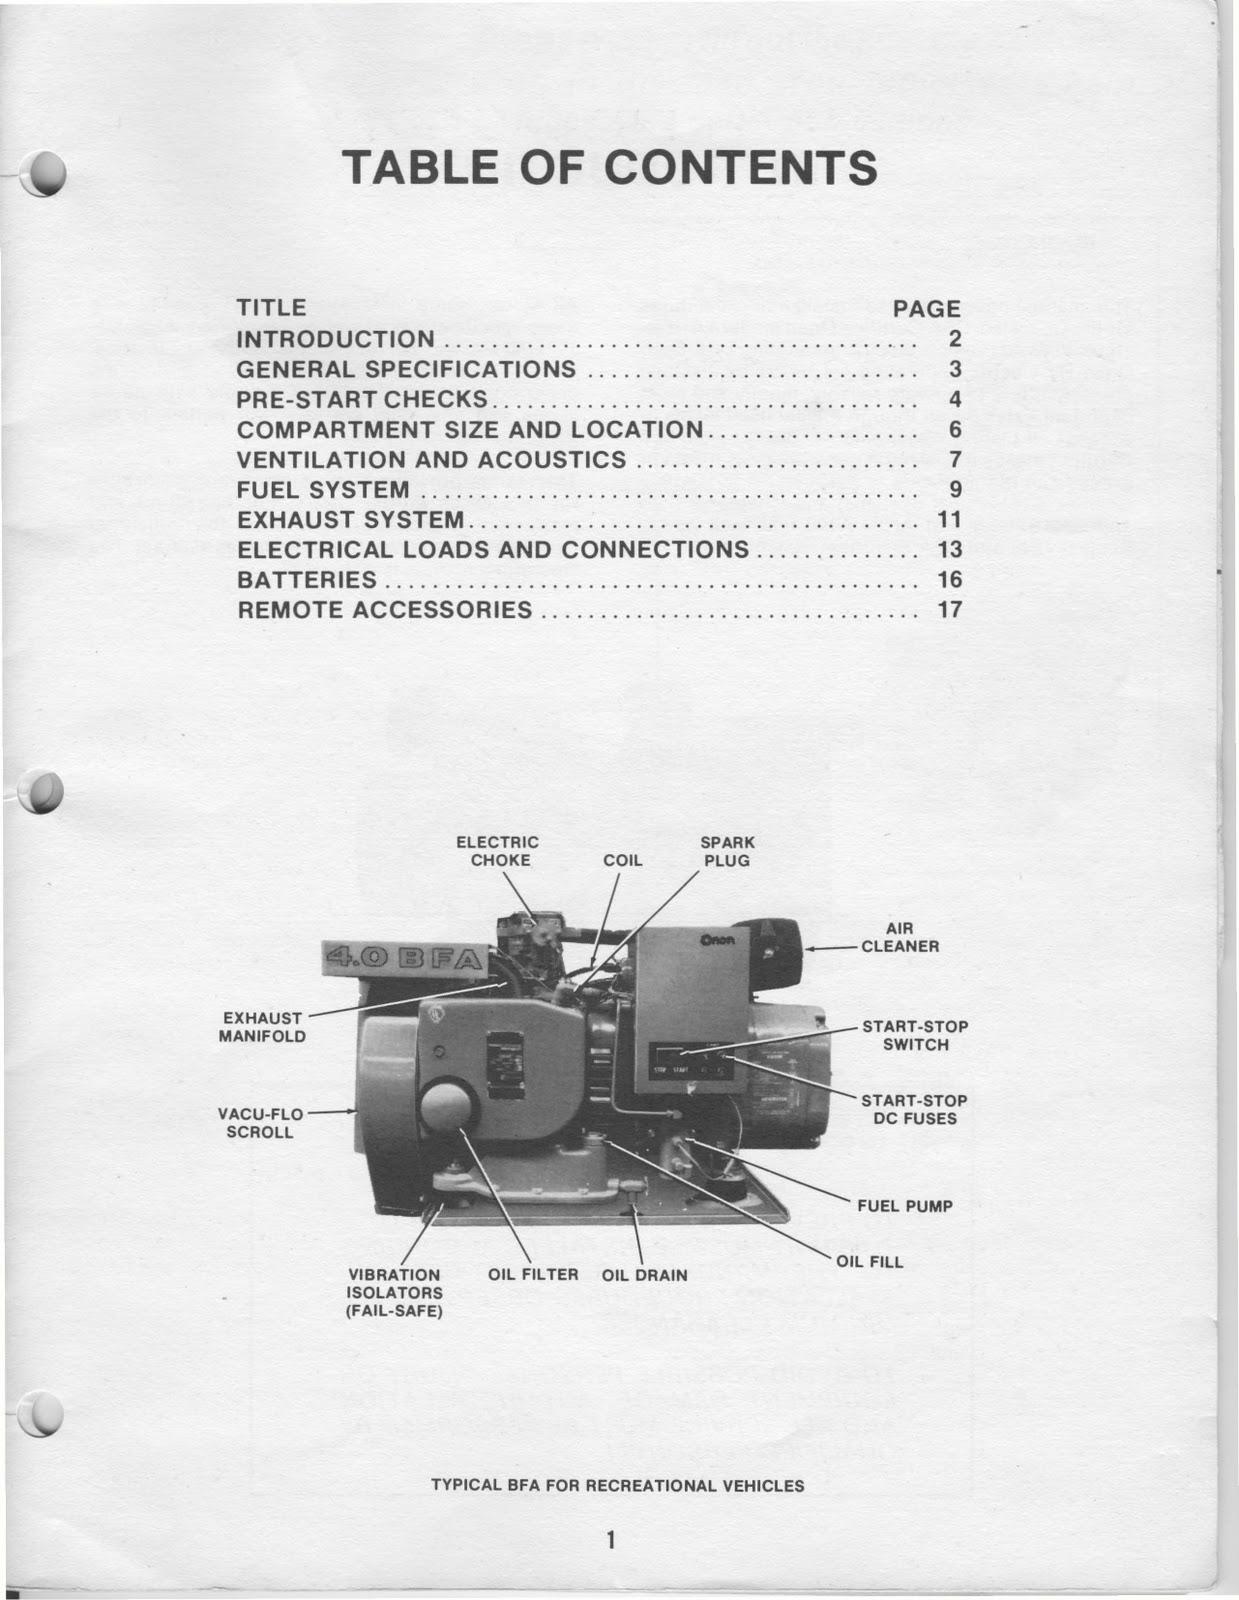 1983 Fleetwood Pace Arrow Owners Manuals: ONAN 40 KW BFA Genset Spec 16004 series installation